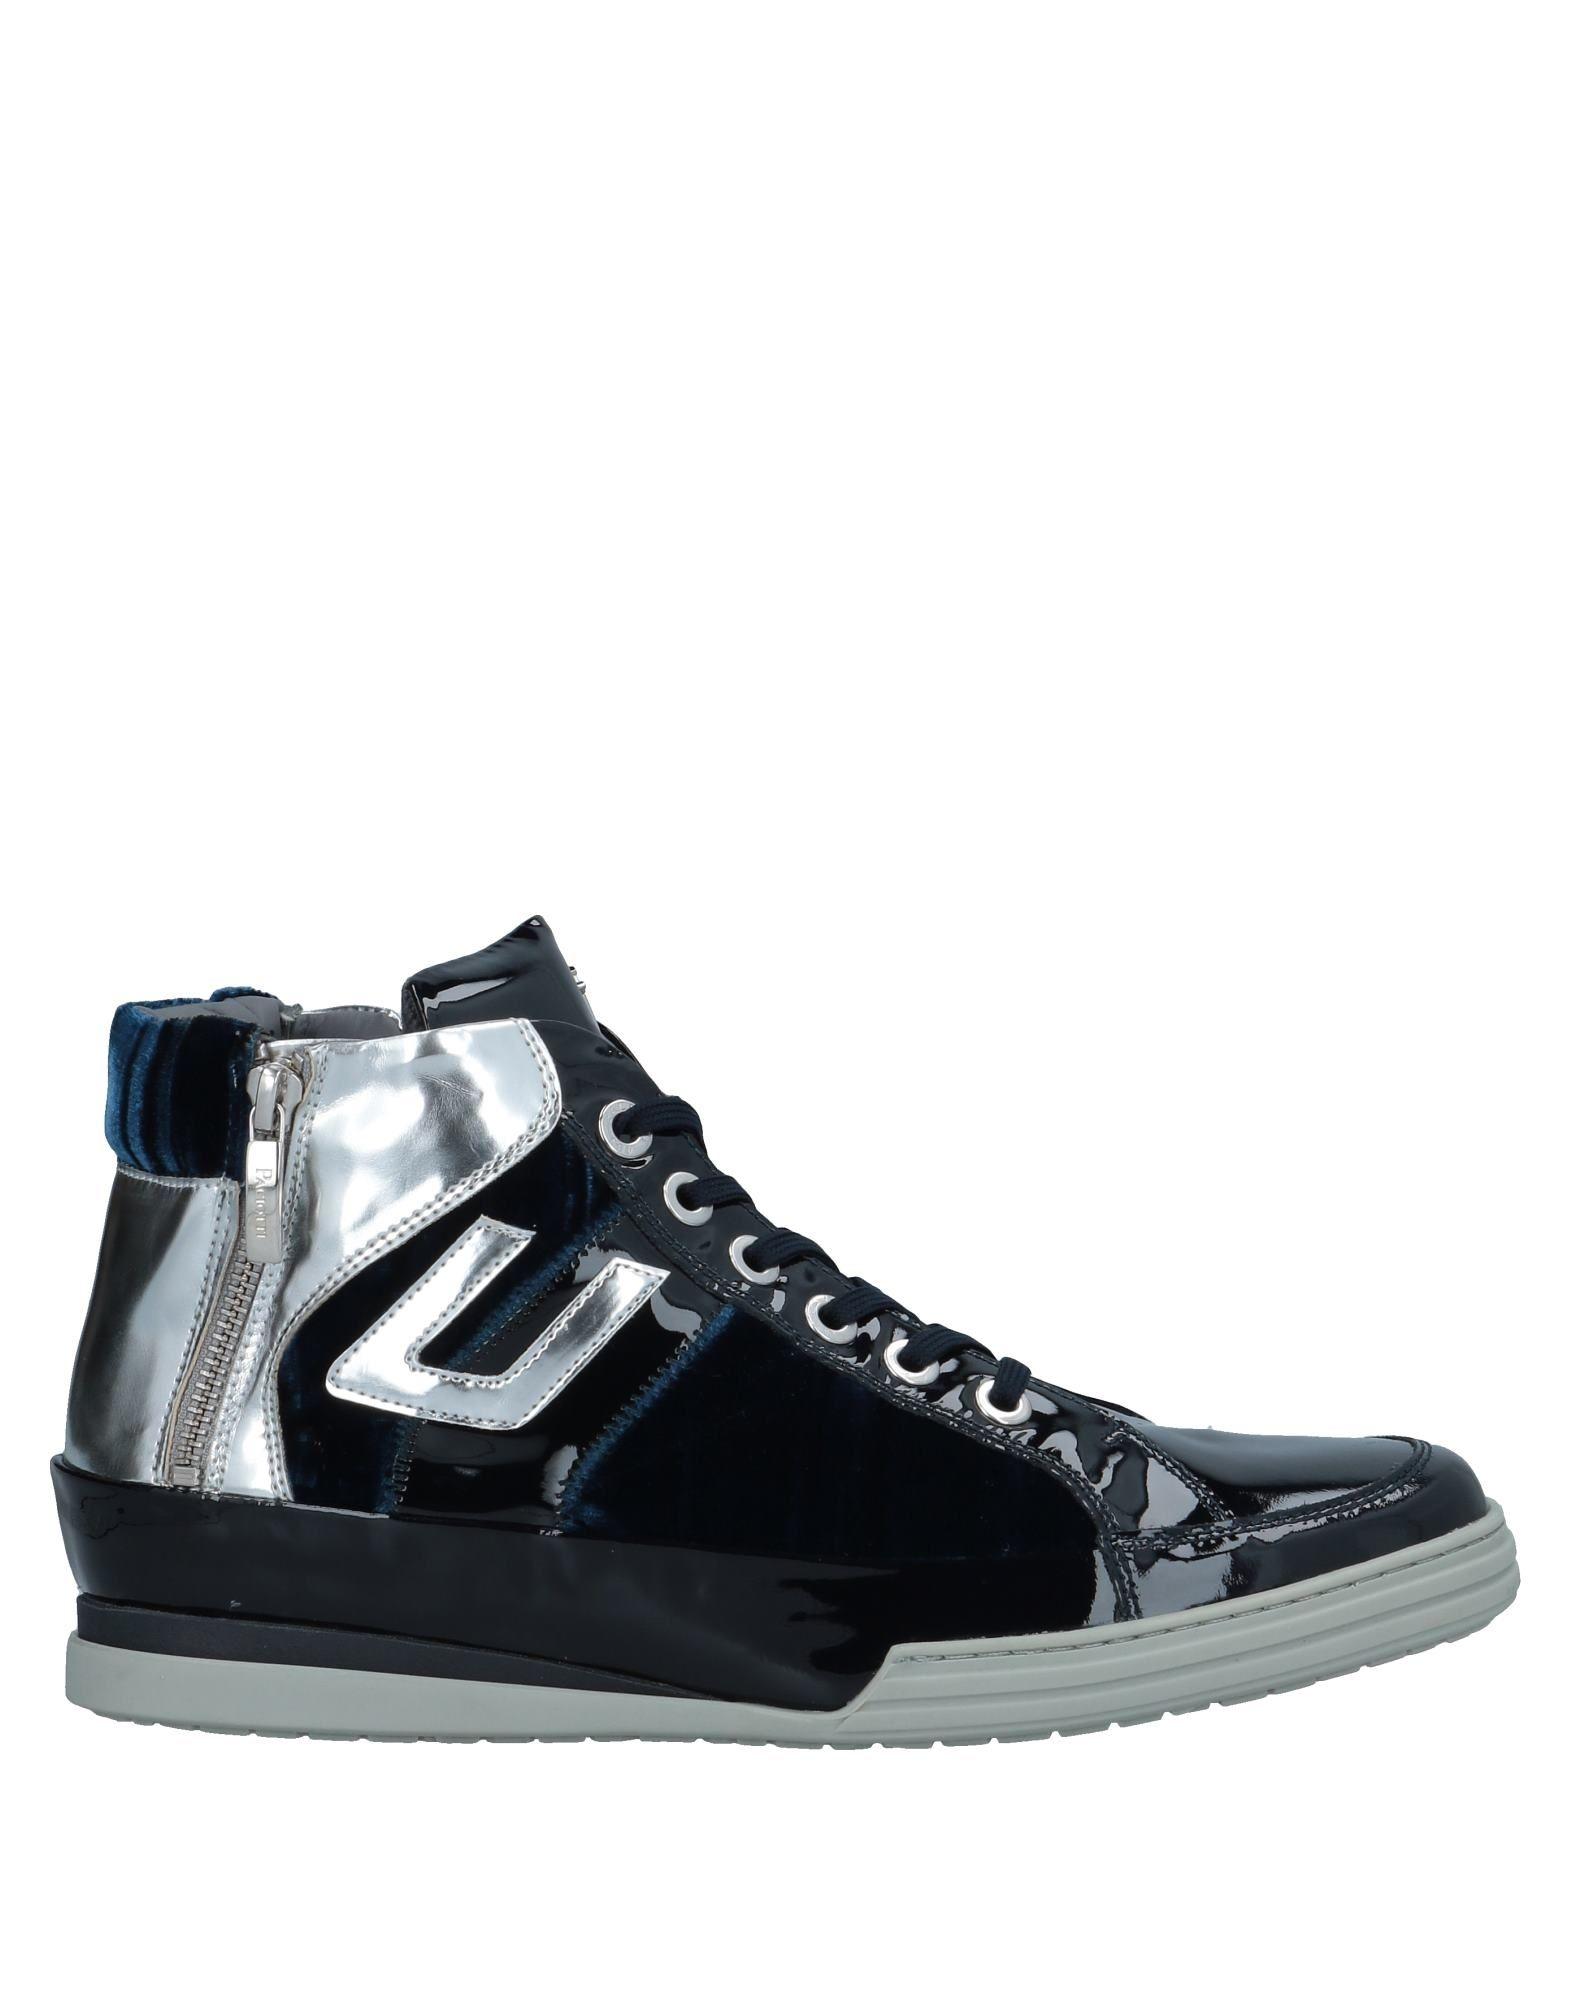 Sneakers Cesare Paciotti 4Us Uomo - 11224707WM